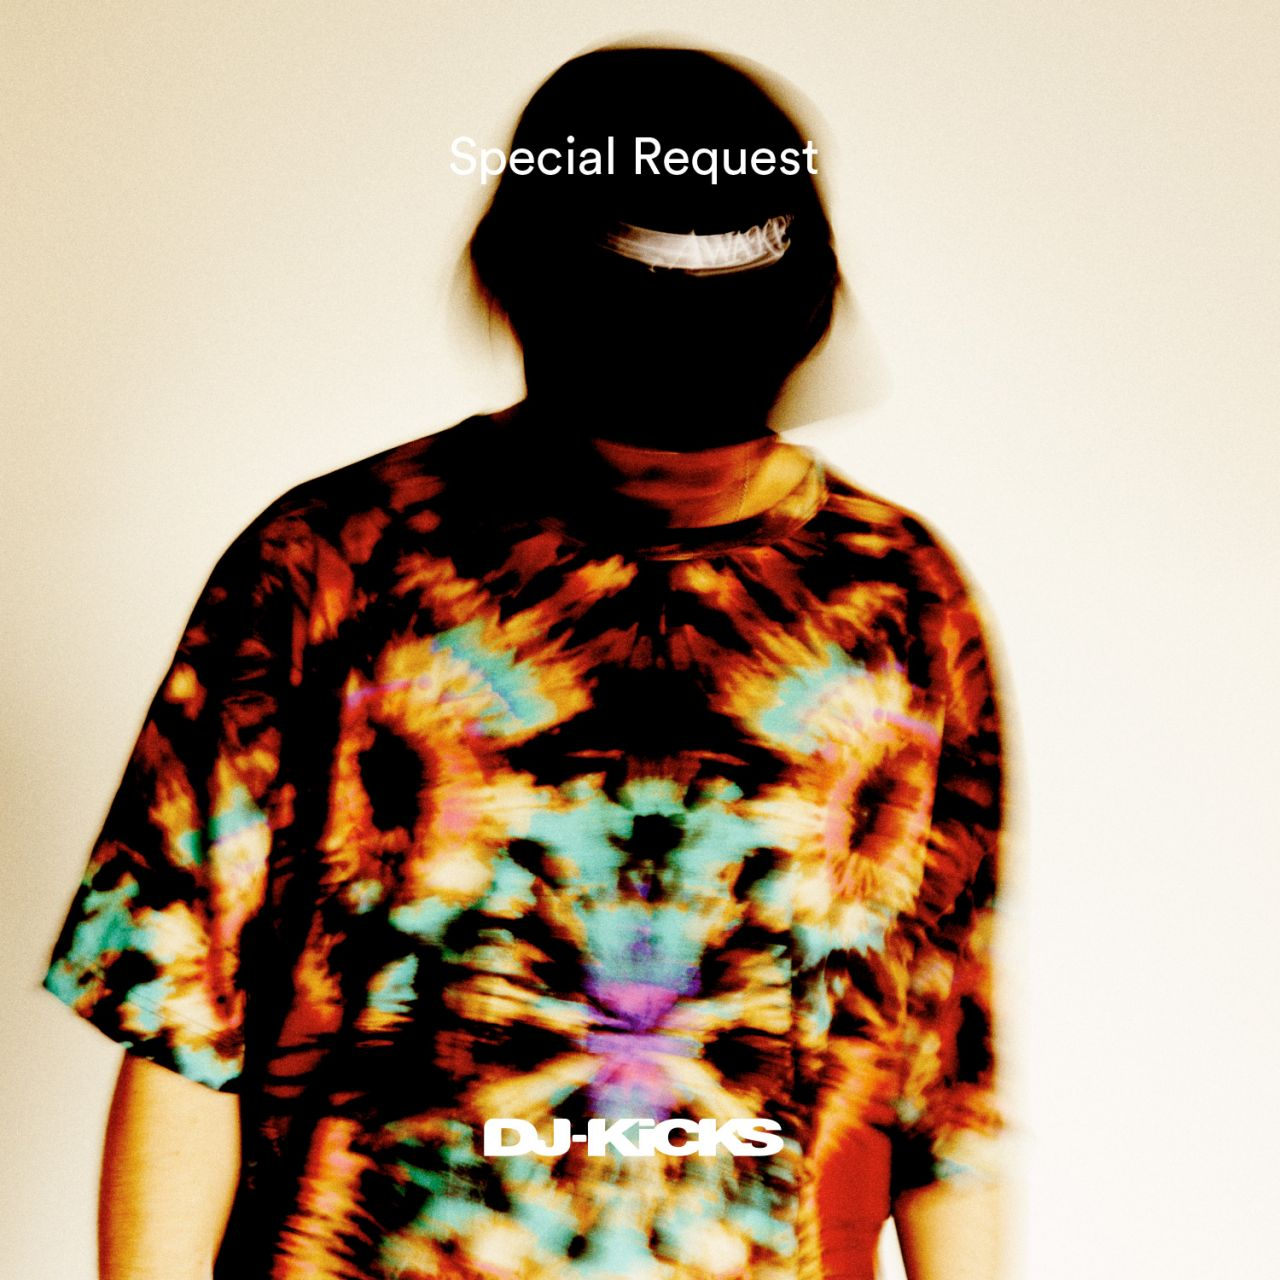 Special Request - DJ Kicks - CD